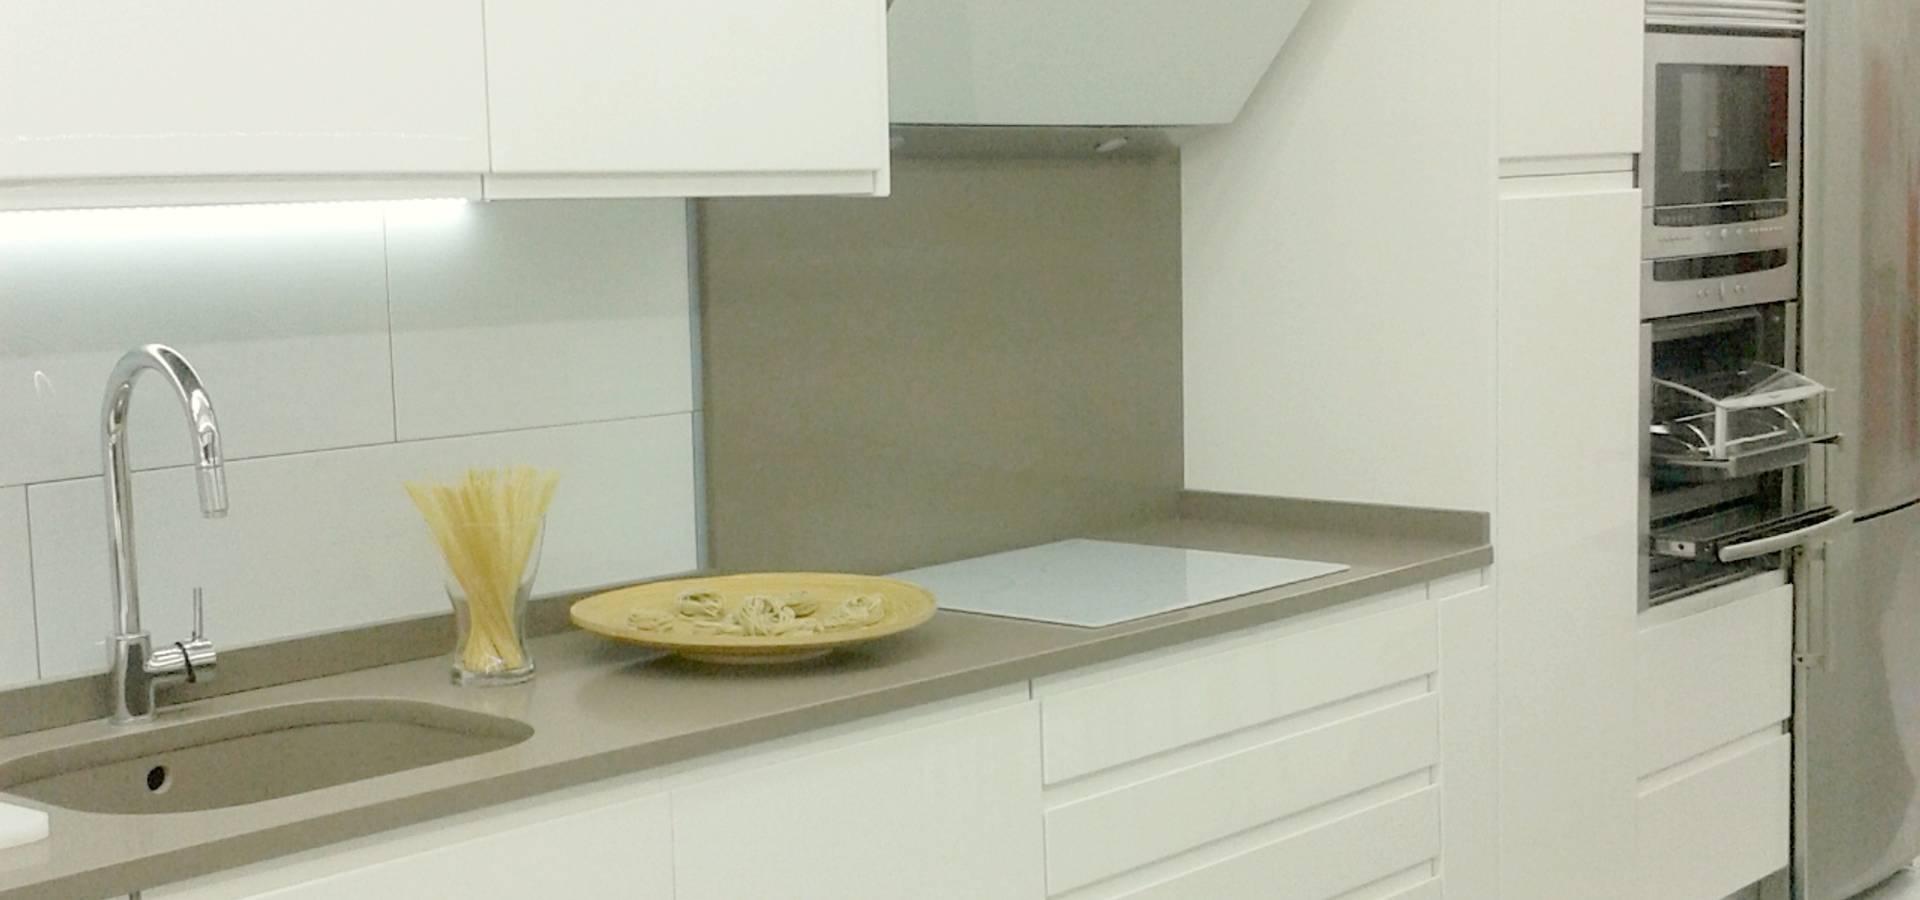 Cocina integral ch dise adores de cocinas en madrid homify - Disenadores de cocinas ...